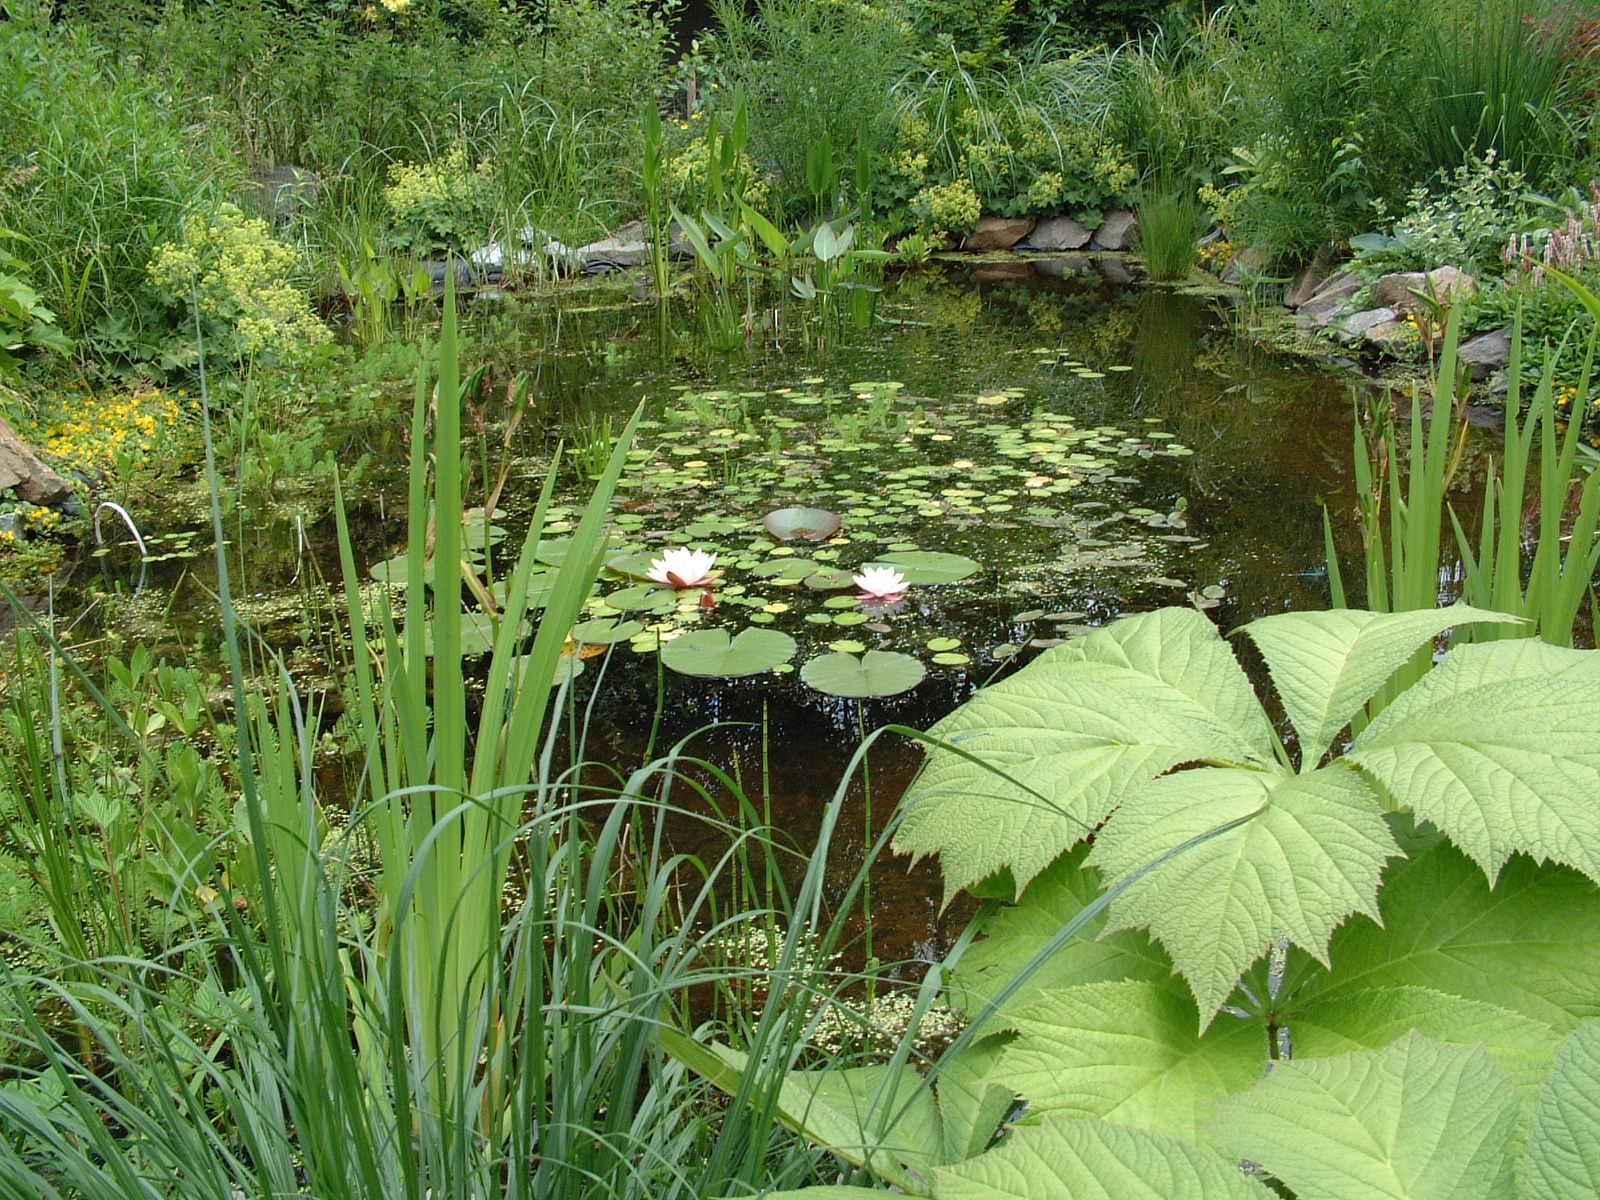 Wateropvang in de tuin